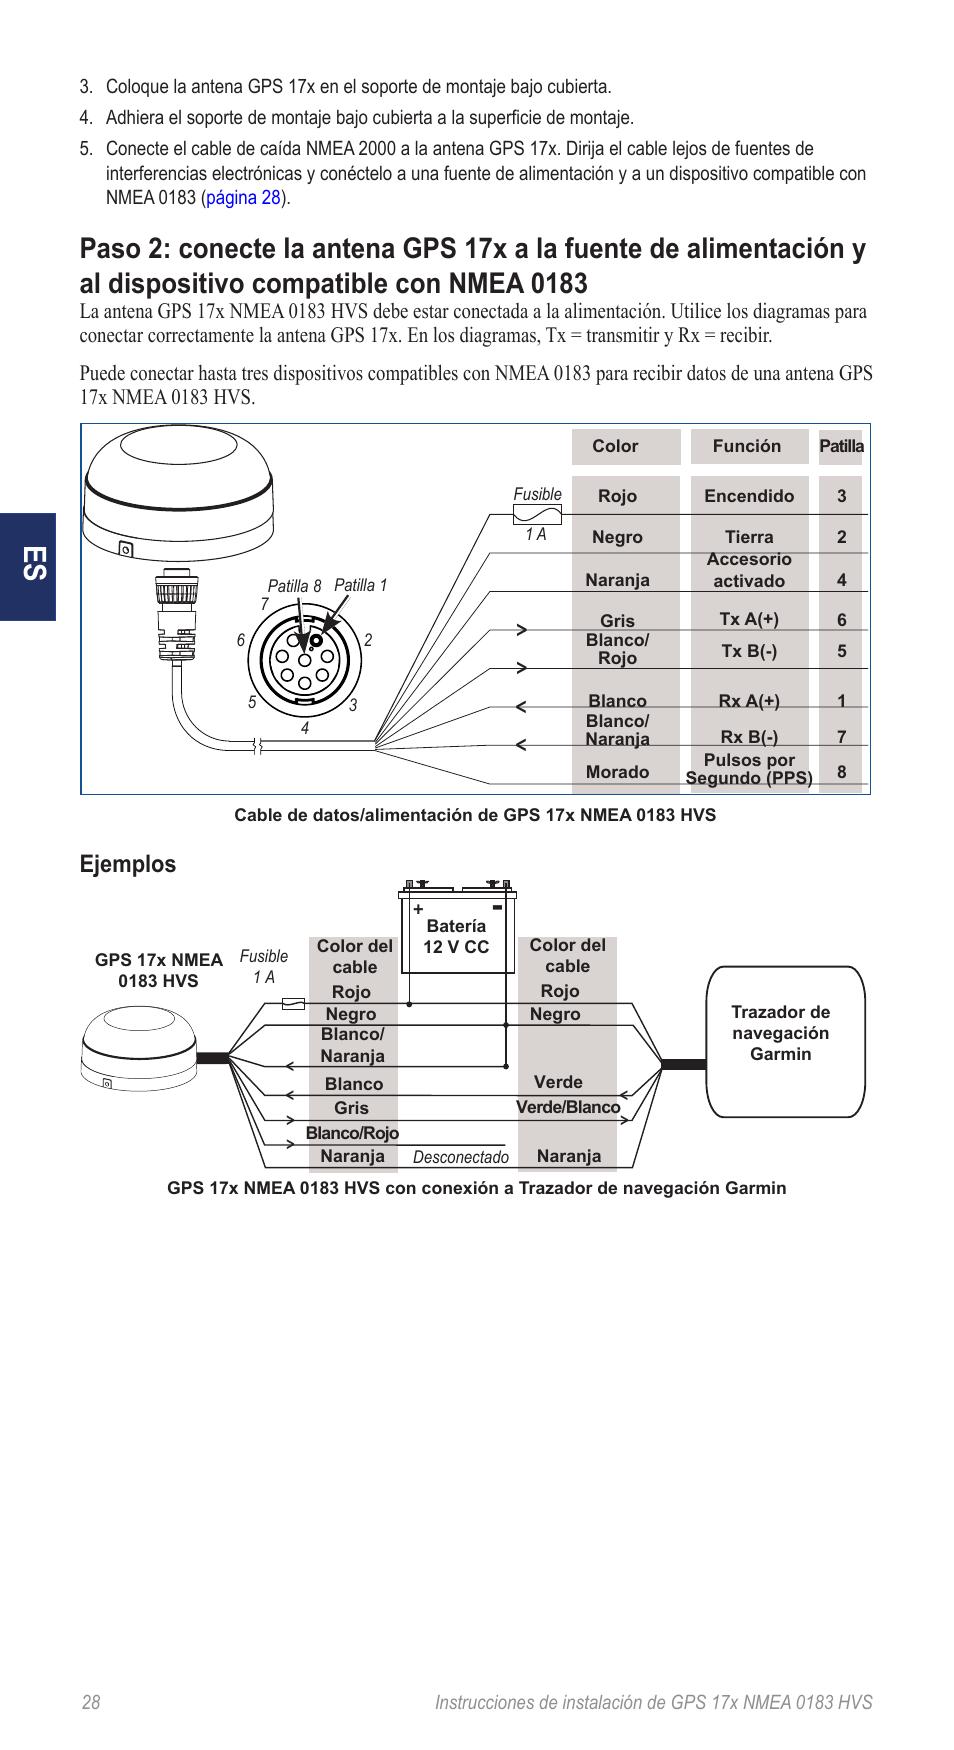 1AEE7 Nmea Gps 0183 Wiring Diagram | Digital Resources on raymarine seatalk wiring, synchro wiring, transducer wiring, nasa wiring, abyc wiring, usb wiring, smartcraft wiring,